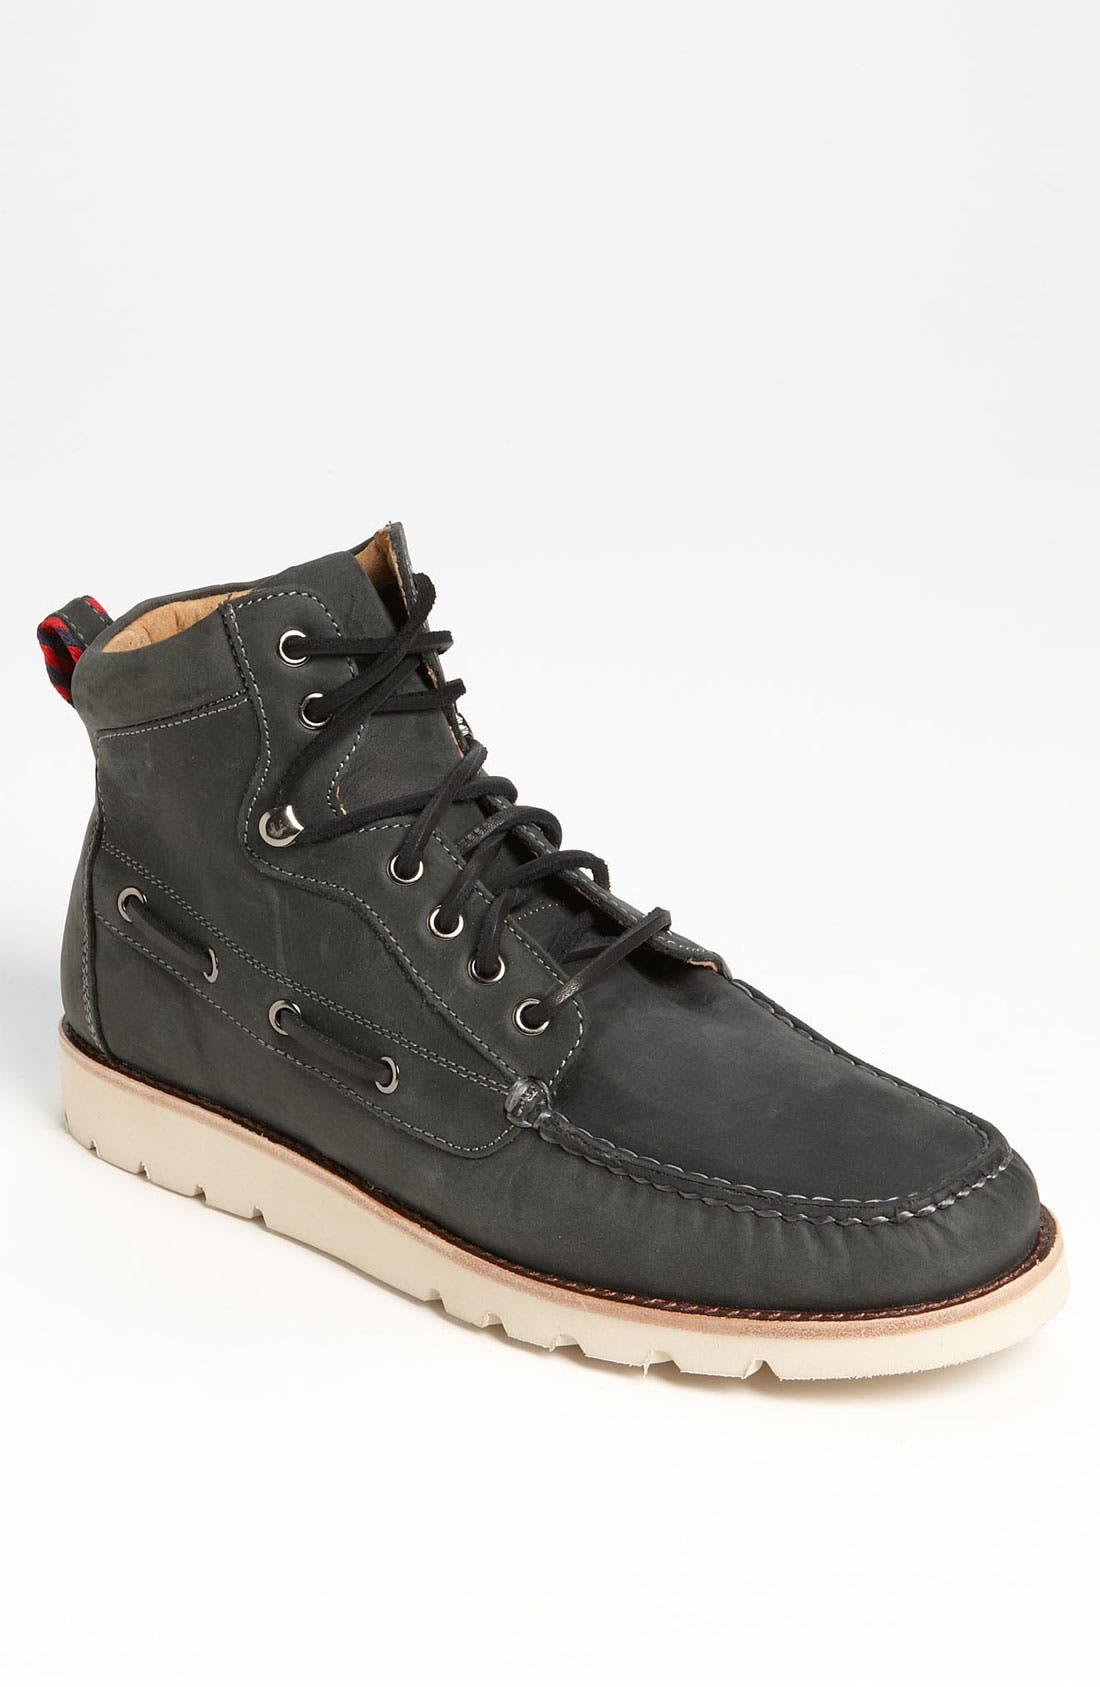 Alternate Image 1 Selected - Polo Ralph Lauren 'Salisbury' Moc Toe Boot